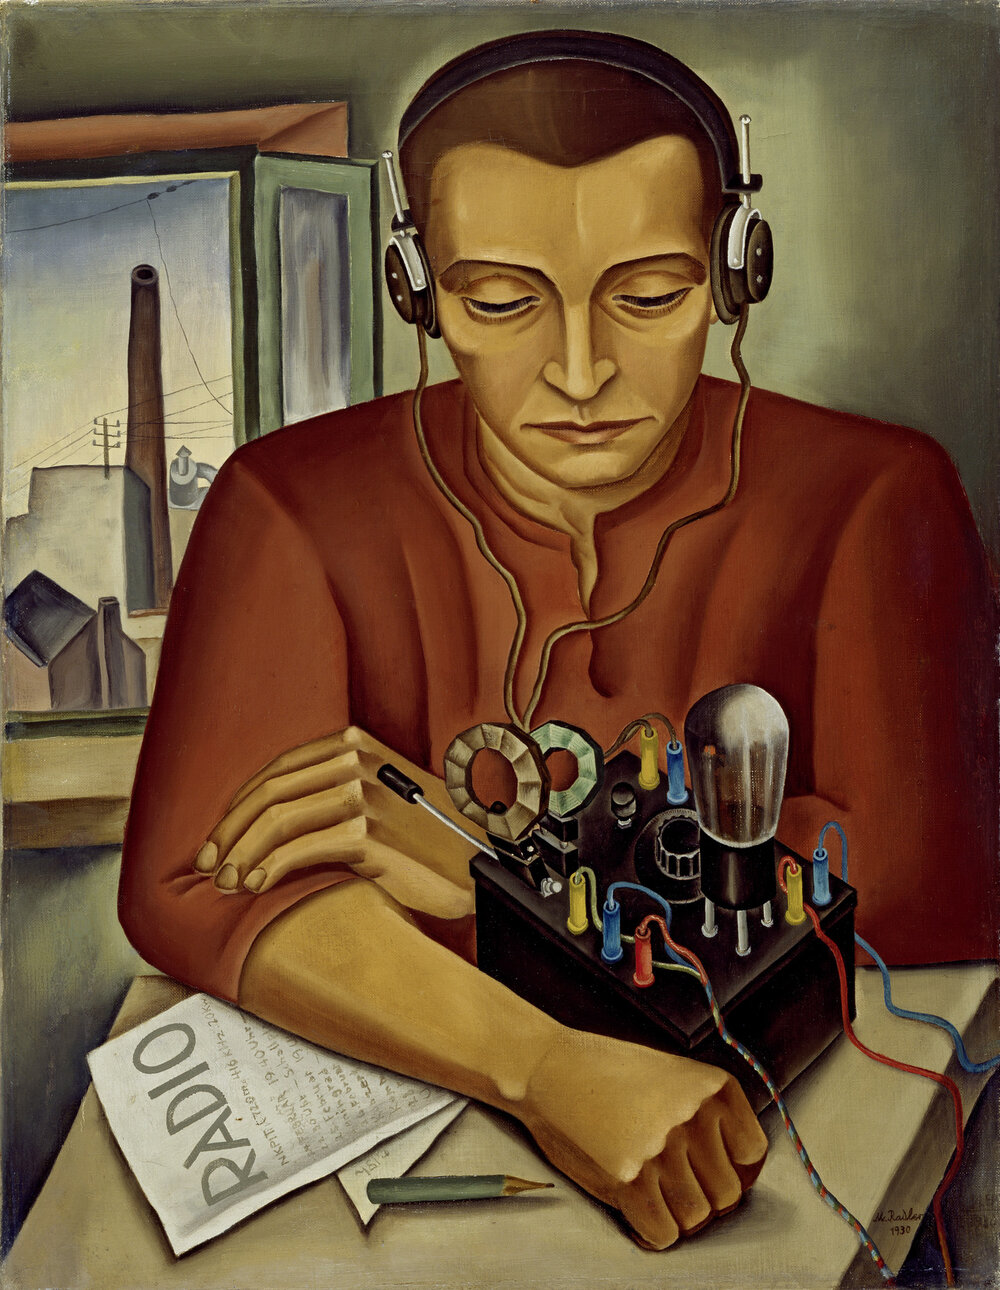 Макс Радлер, The Radio Listener, 1930. Lenbachhaus Munich. Світлина: Lenbachhaus. © Max Radler or legal succession.